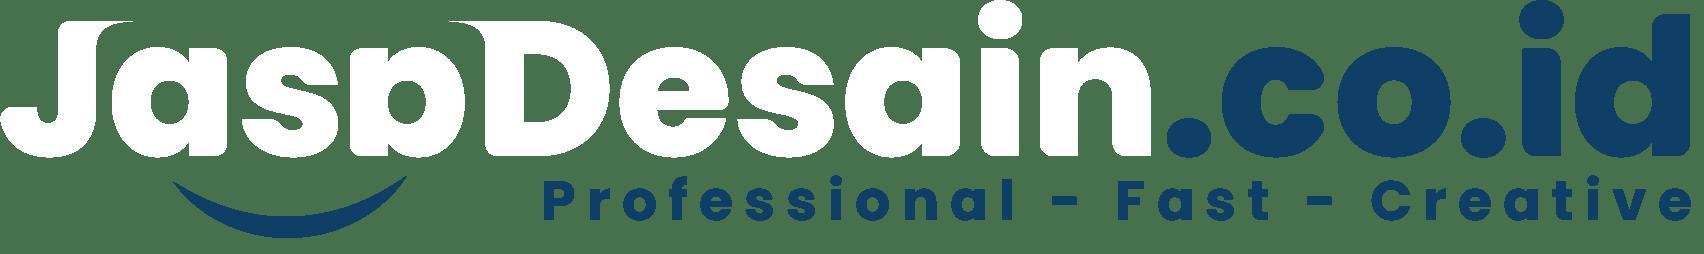 Jasa Desain Logo, Brosur, Company Profile dan Website